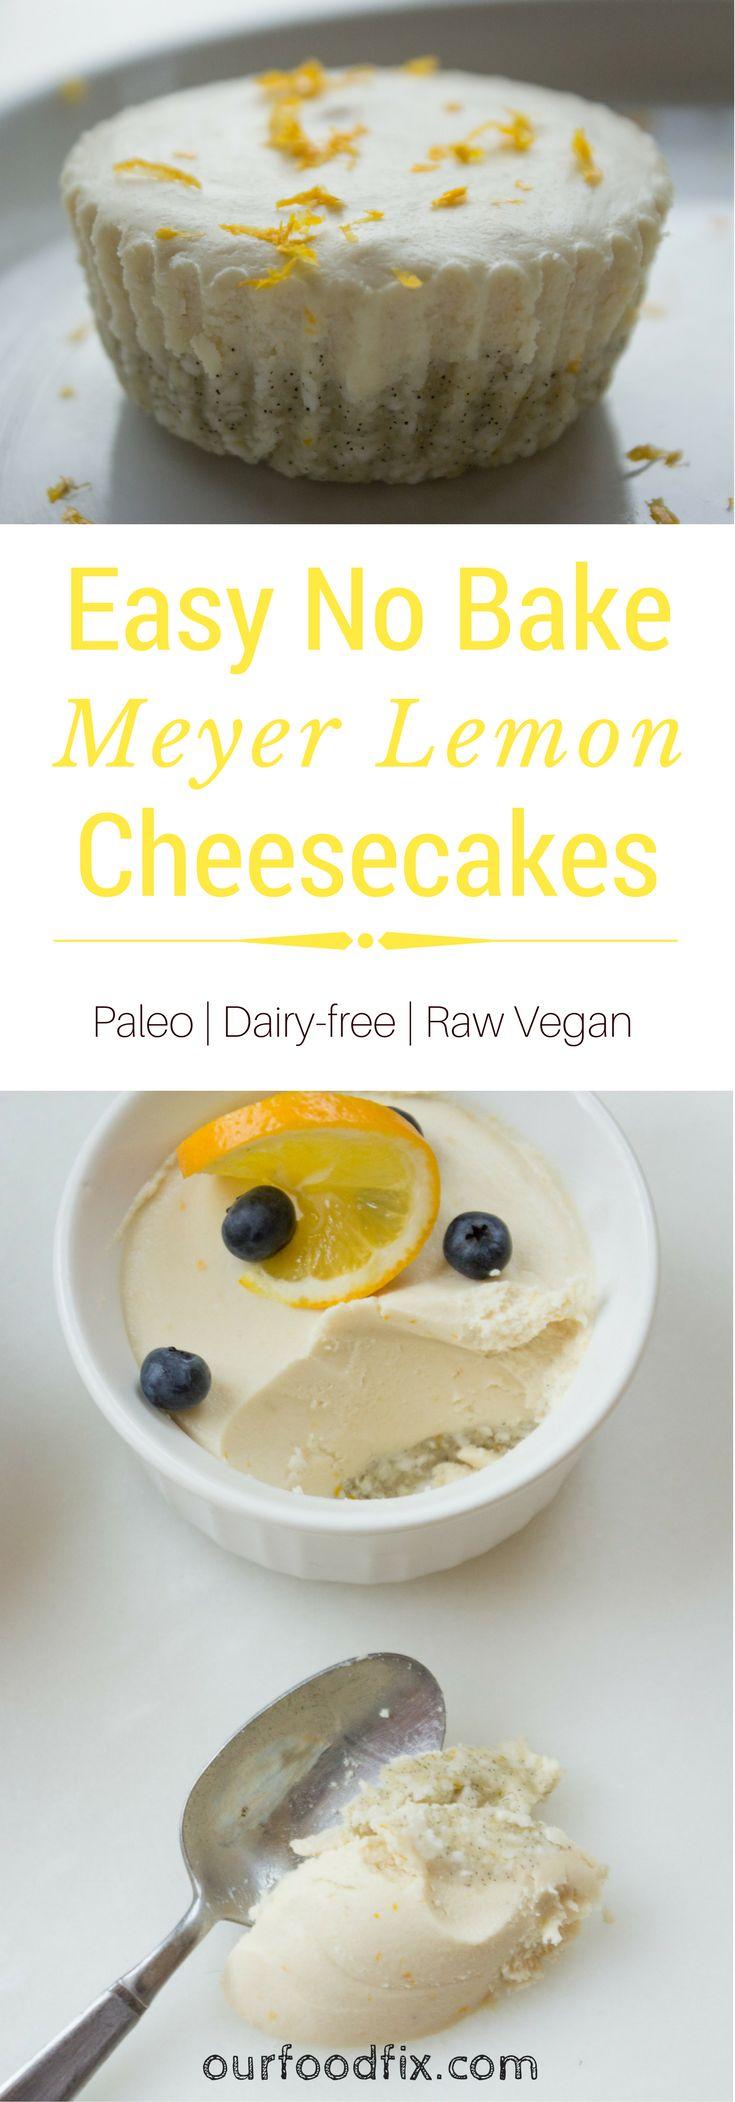 Easy No Bake Meyer Lemon Cheesecakes (Paleo + Vegan)